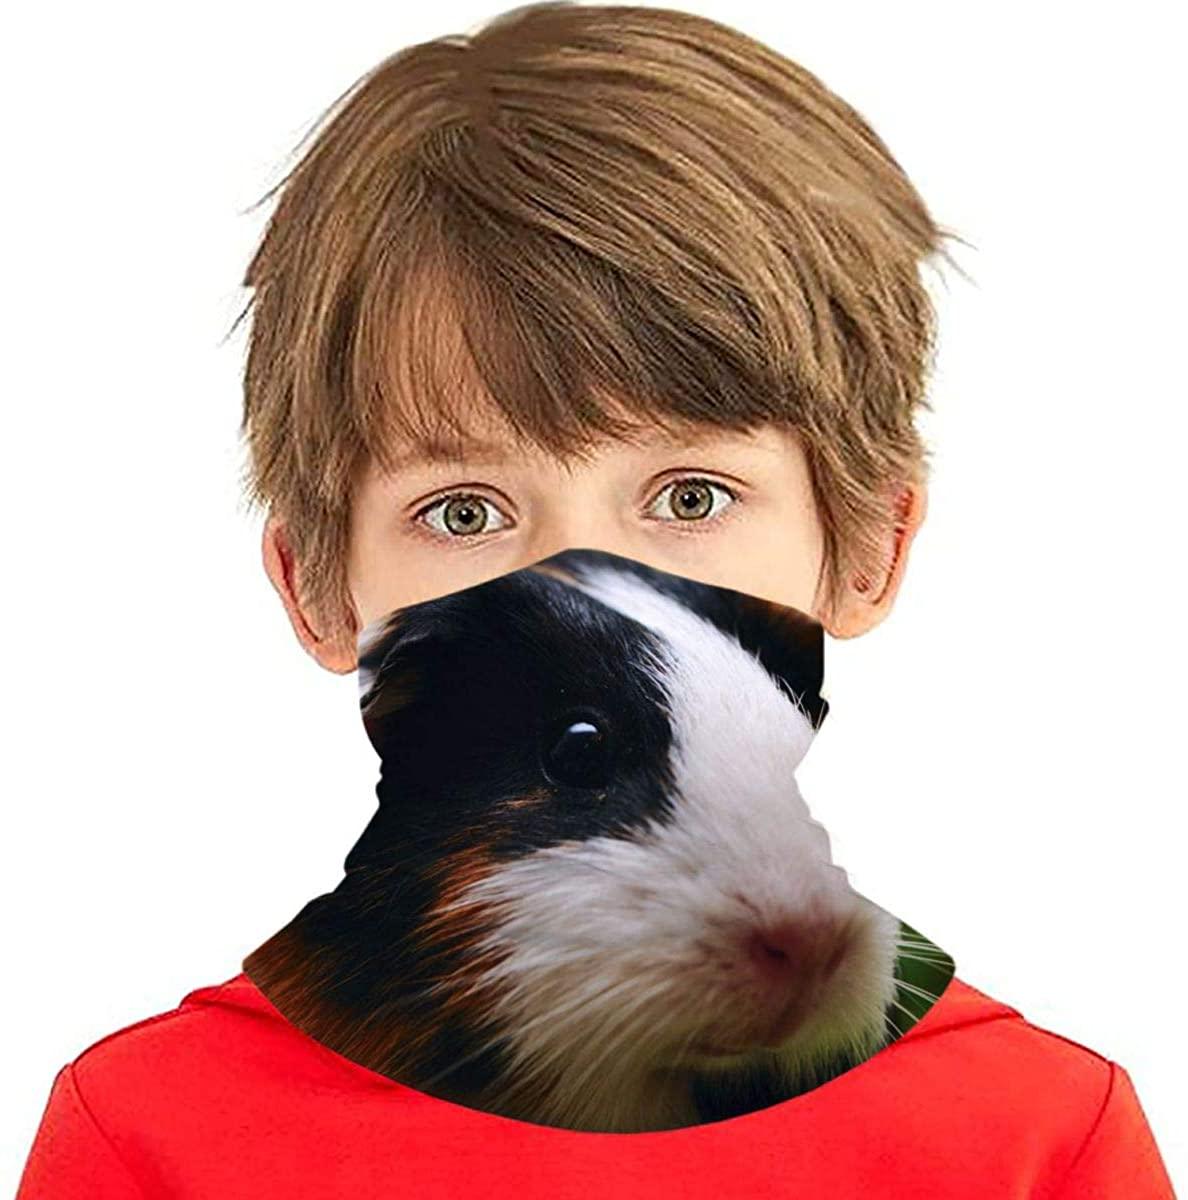 Youth Face Bandanas, Guinea Pigs Reusable Face Mask Half Face Towel Mouth Cloth Facial Scarf Variety Headscarf